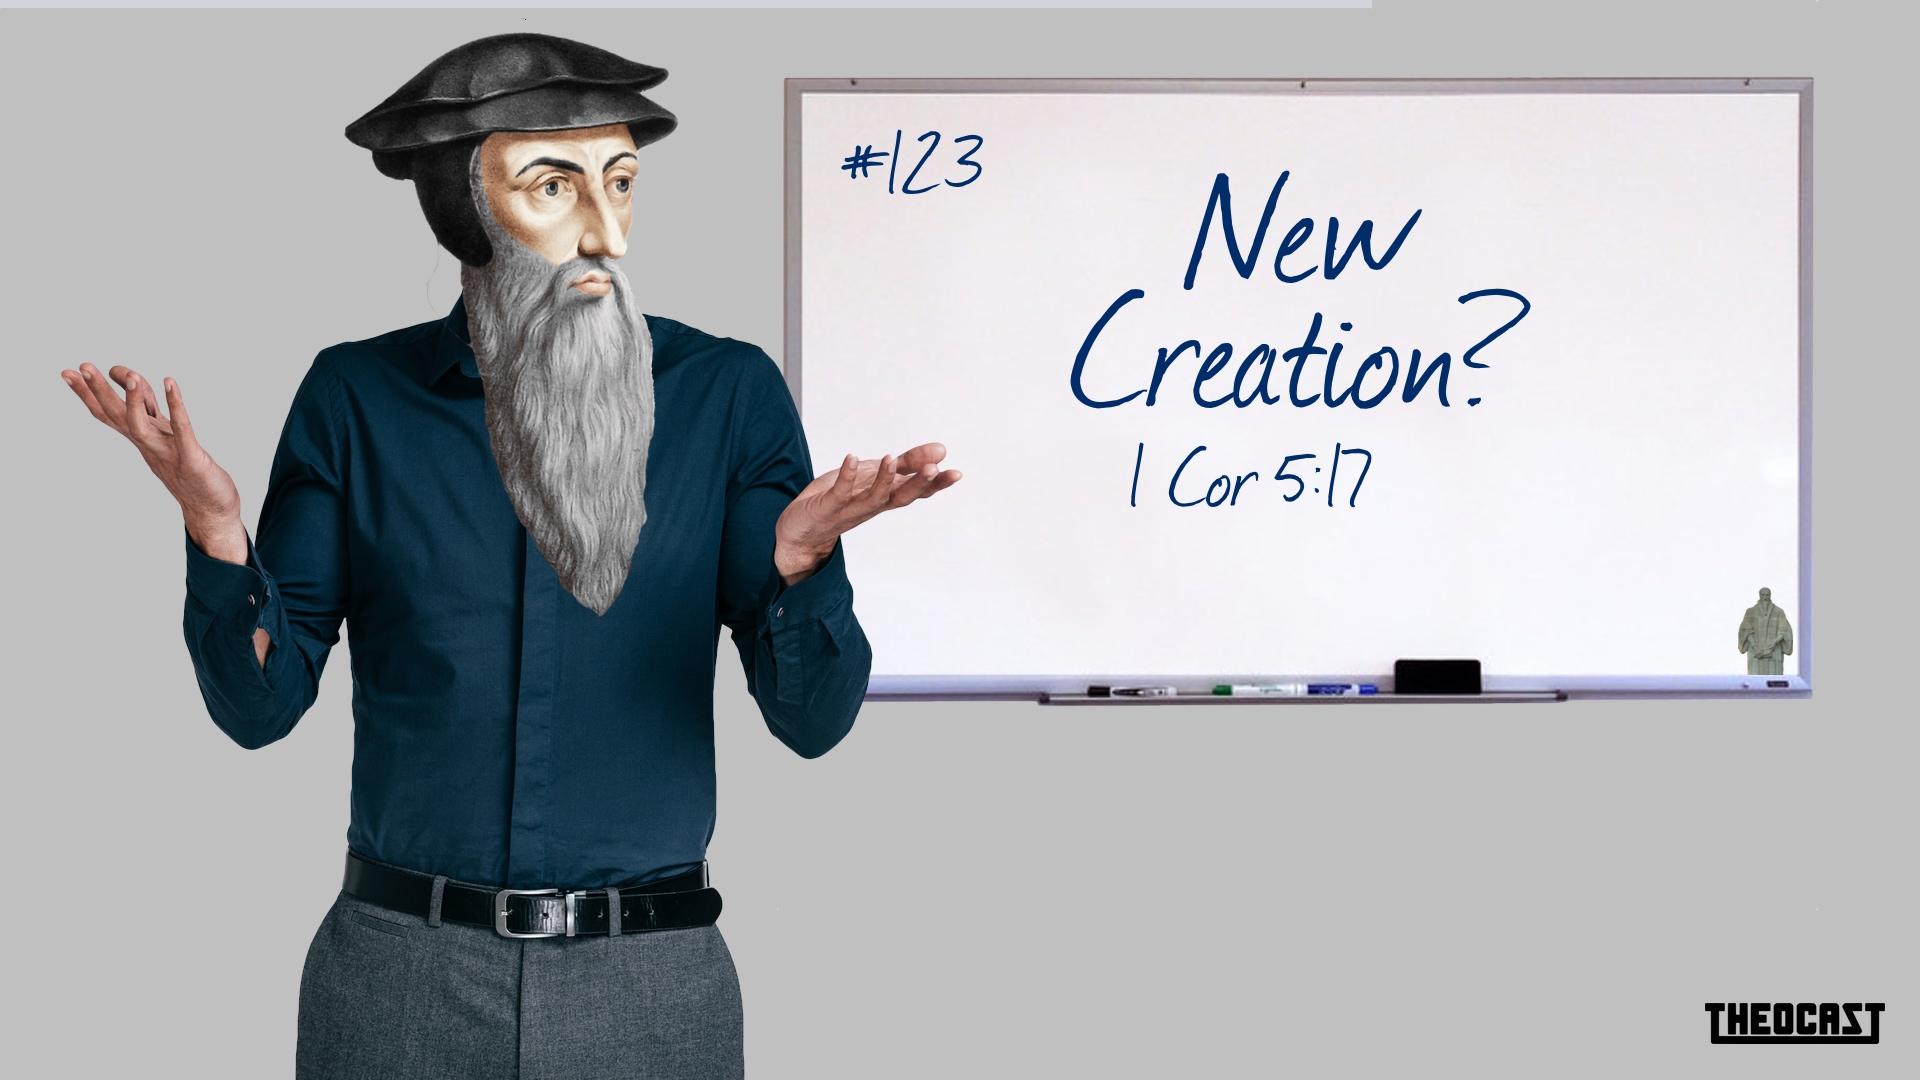 #123 New Creation? 2 Cor 5:17